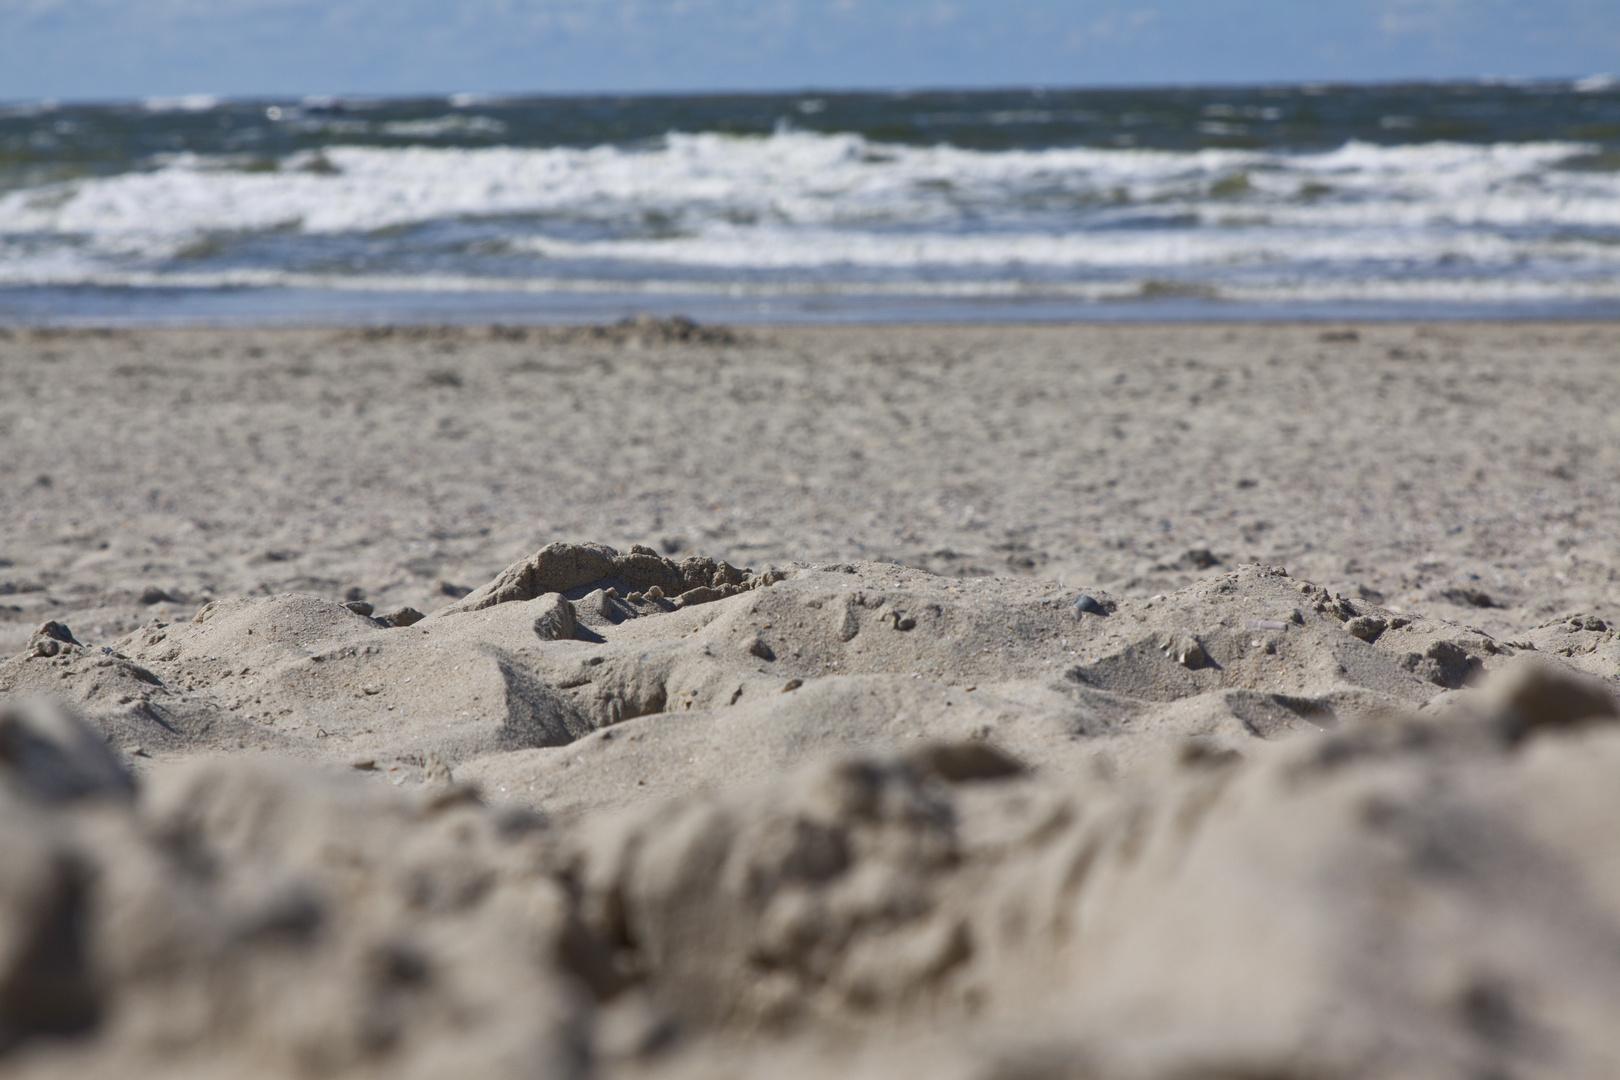 A little bit sandy over here ...